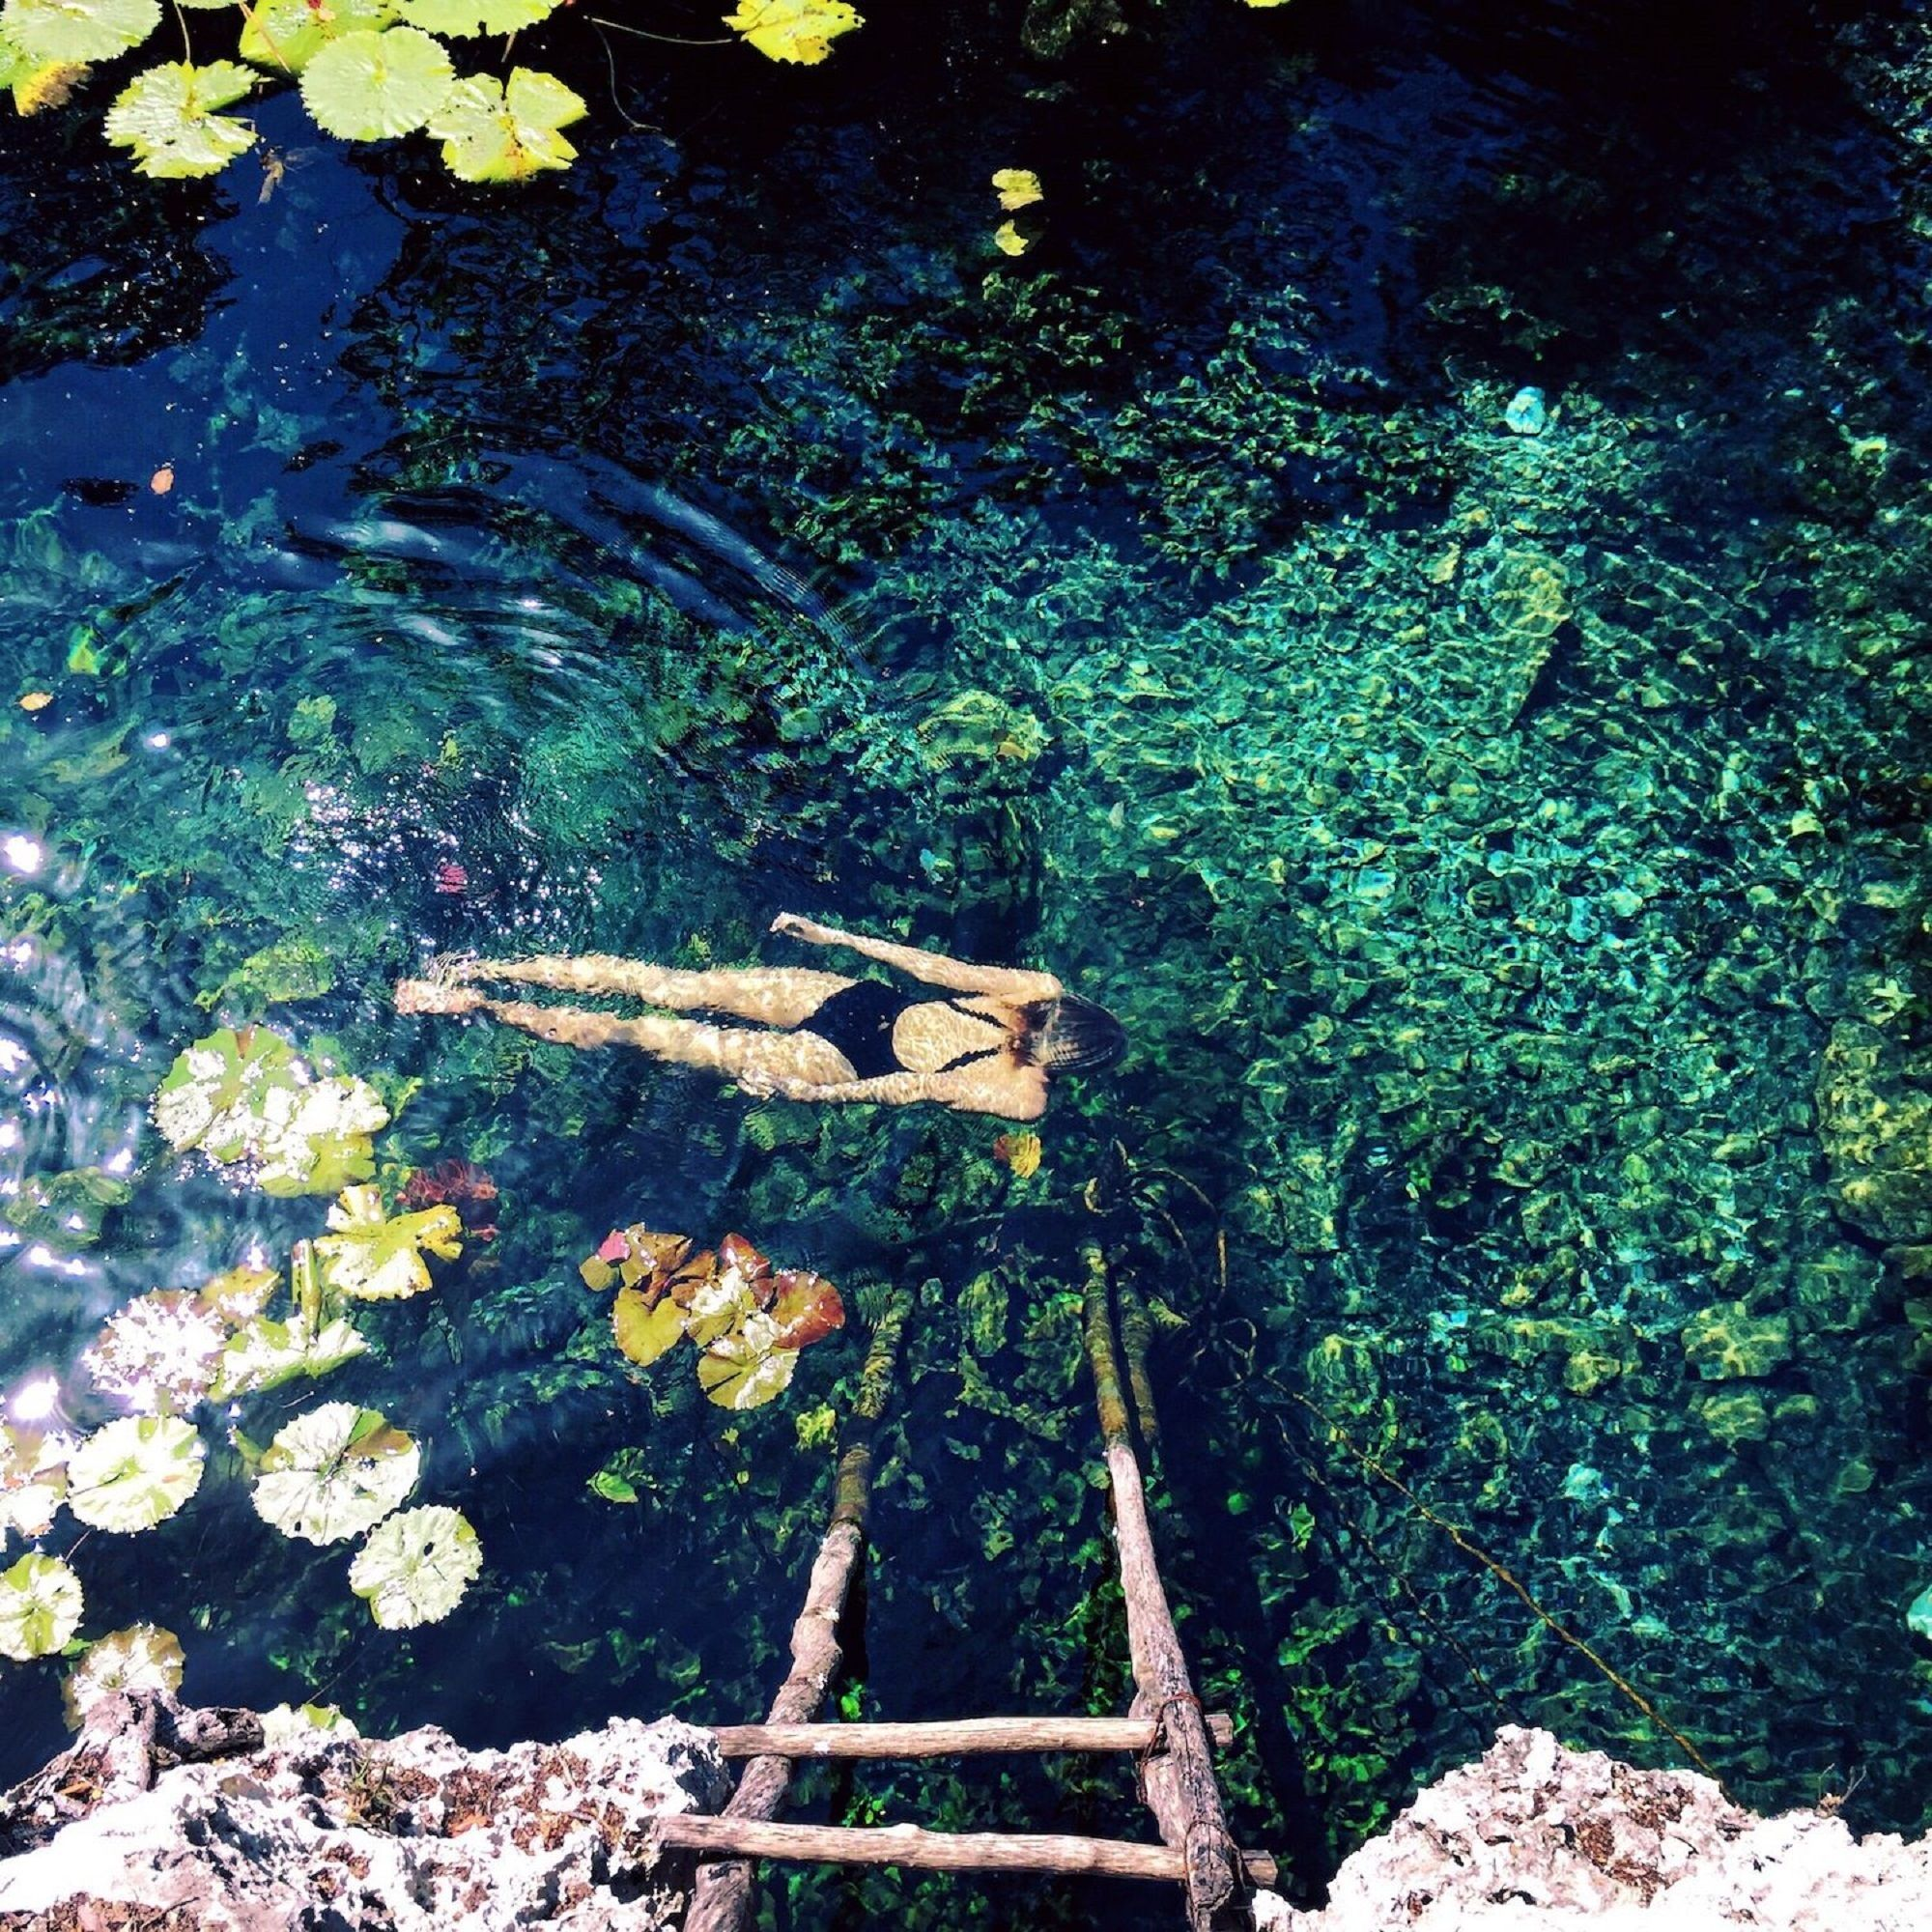 cenote nicteha 2.jpg